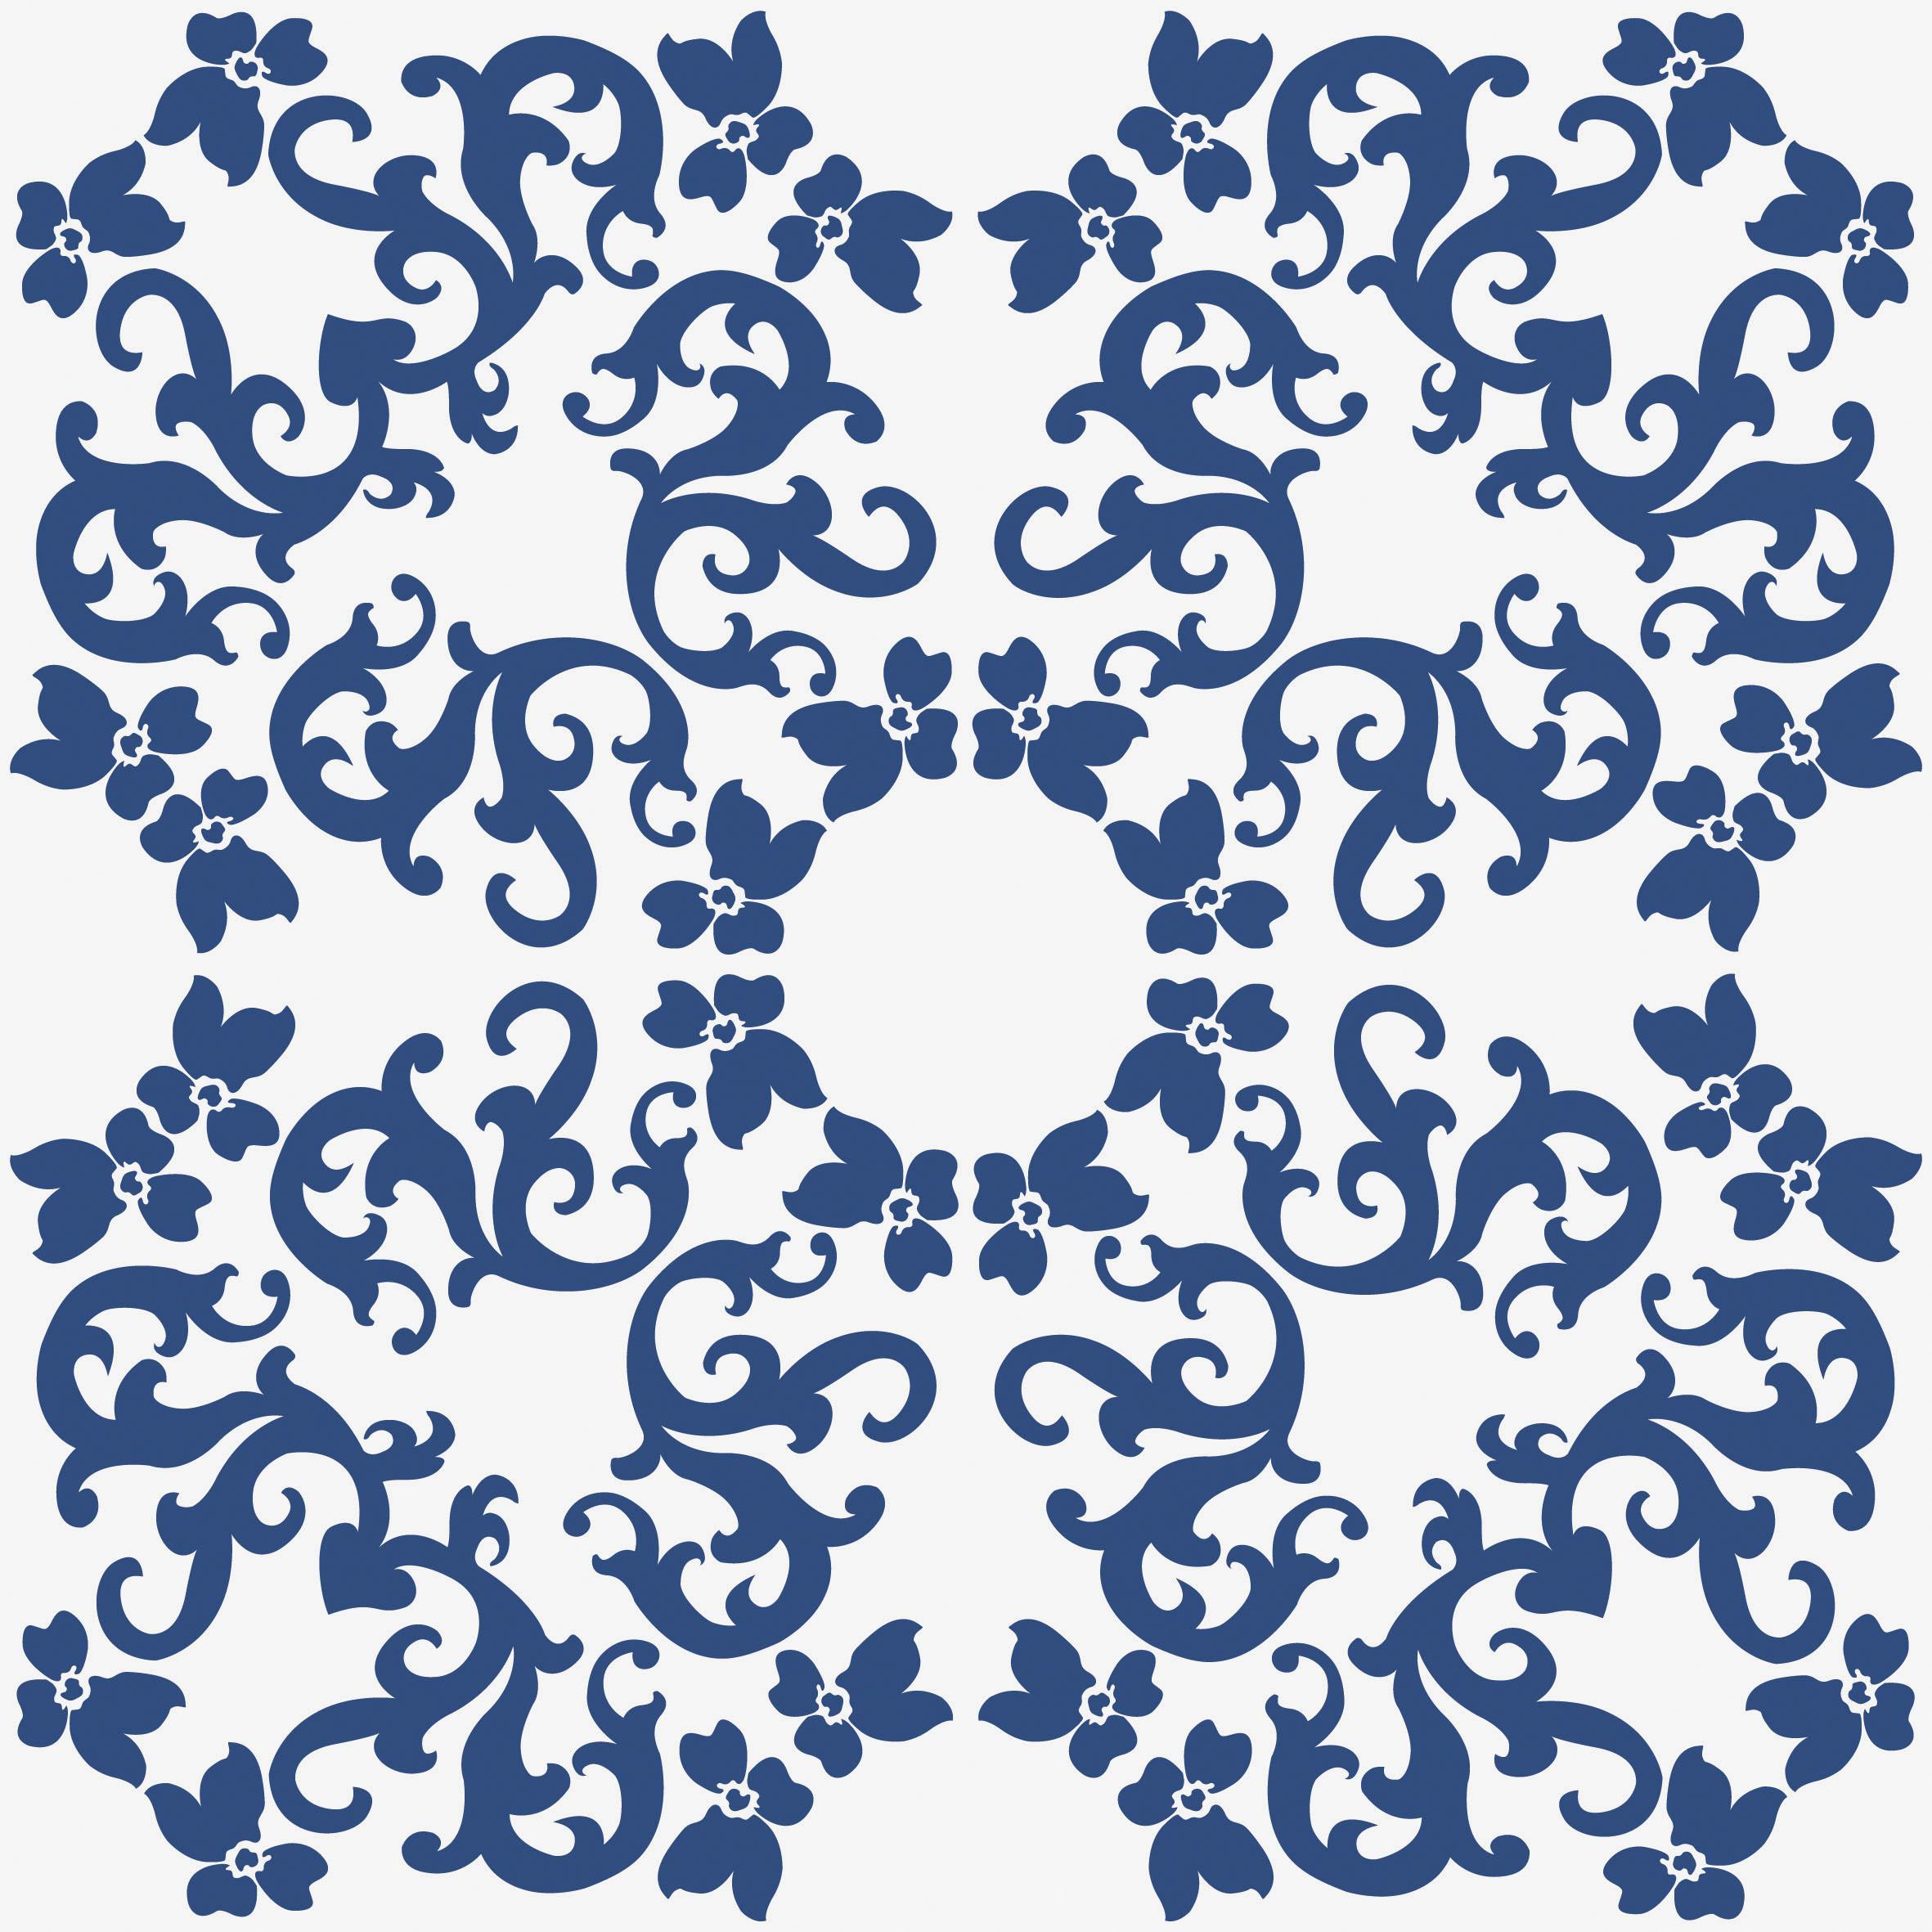 Iris 1 c6 ceramic tiles from ceramica bardelli architonic - Piastrelle 20x20 bianche ...